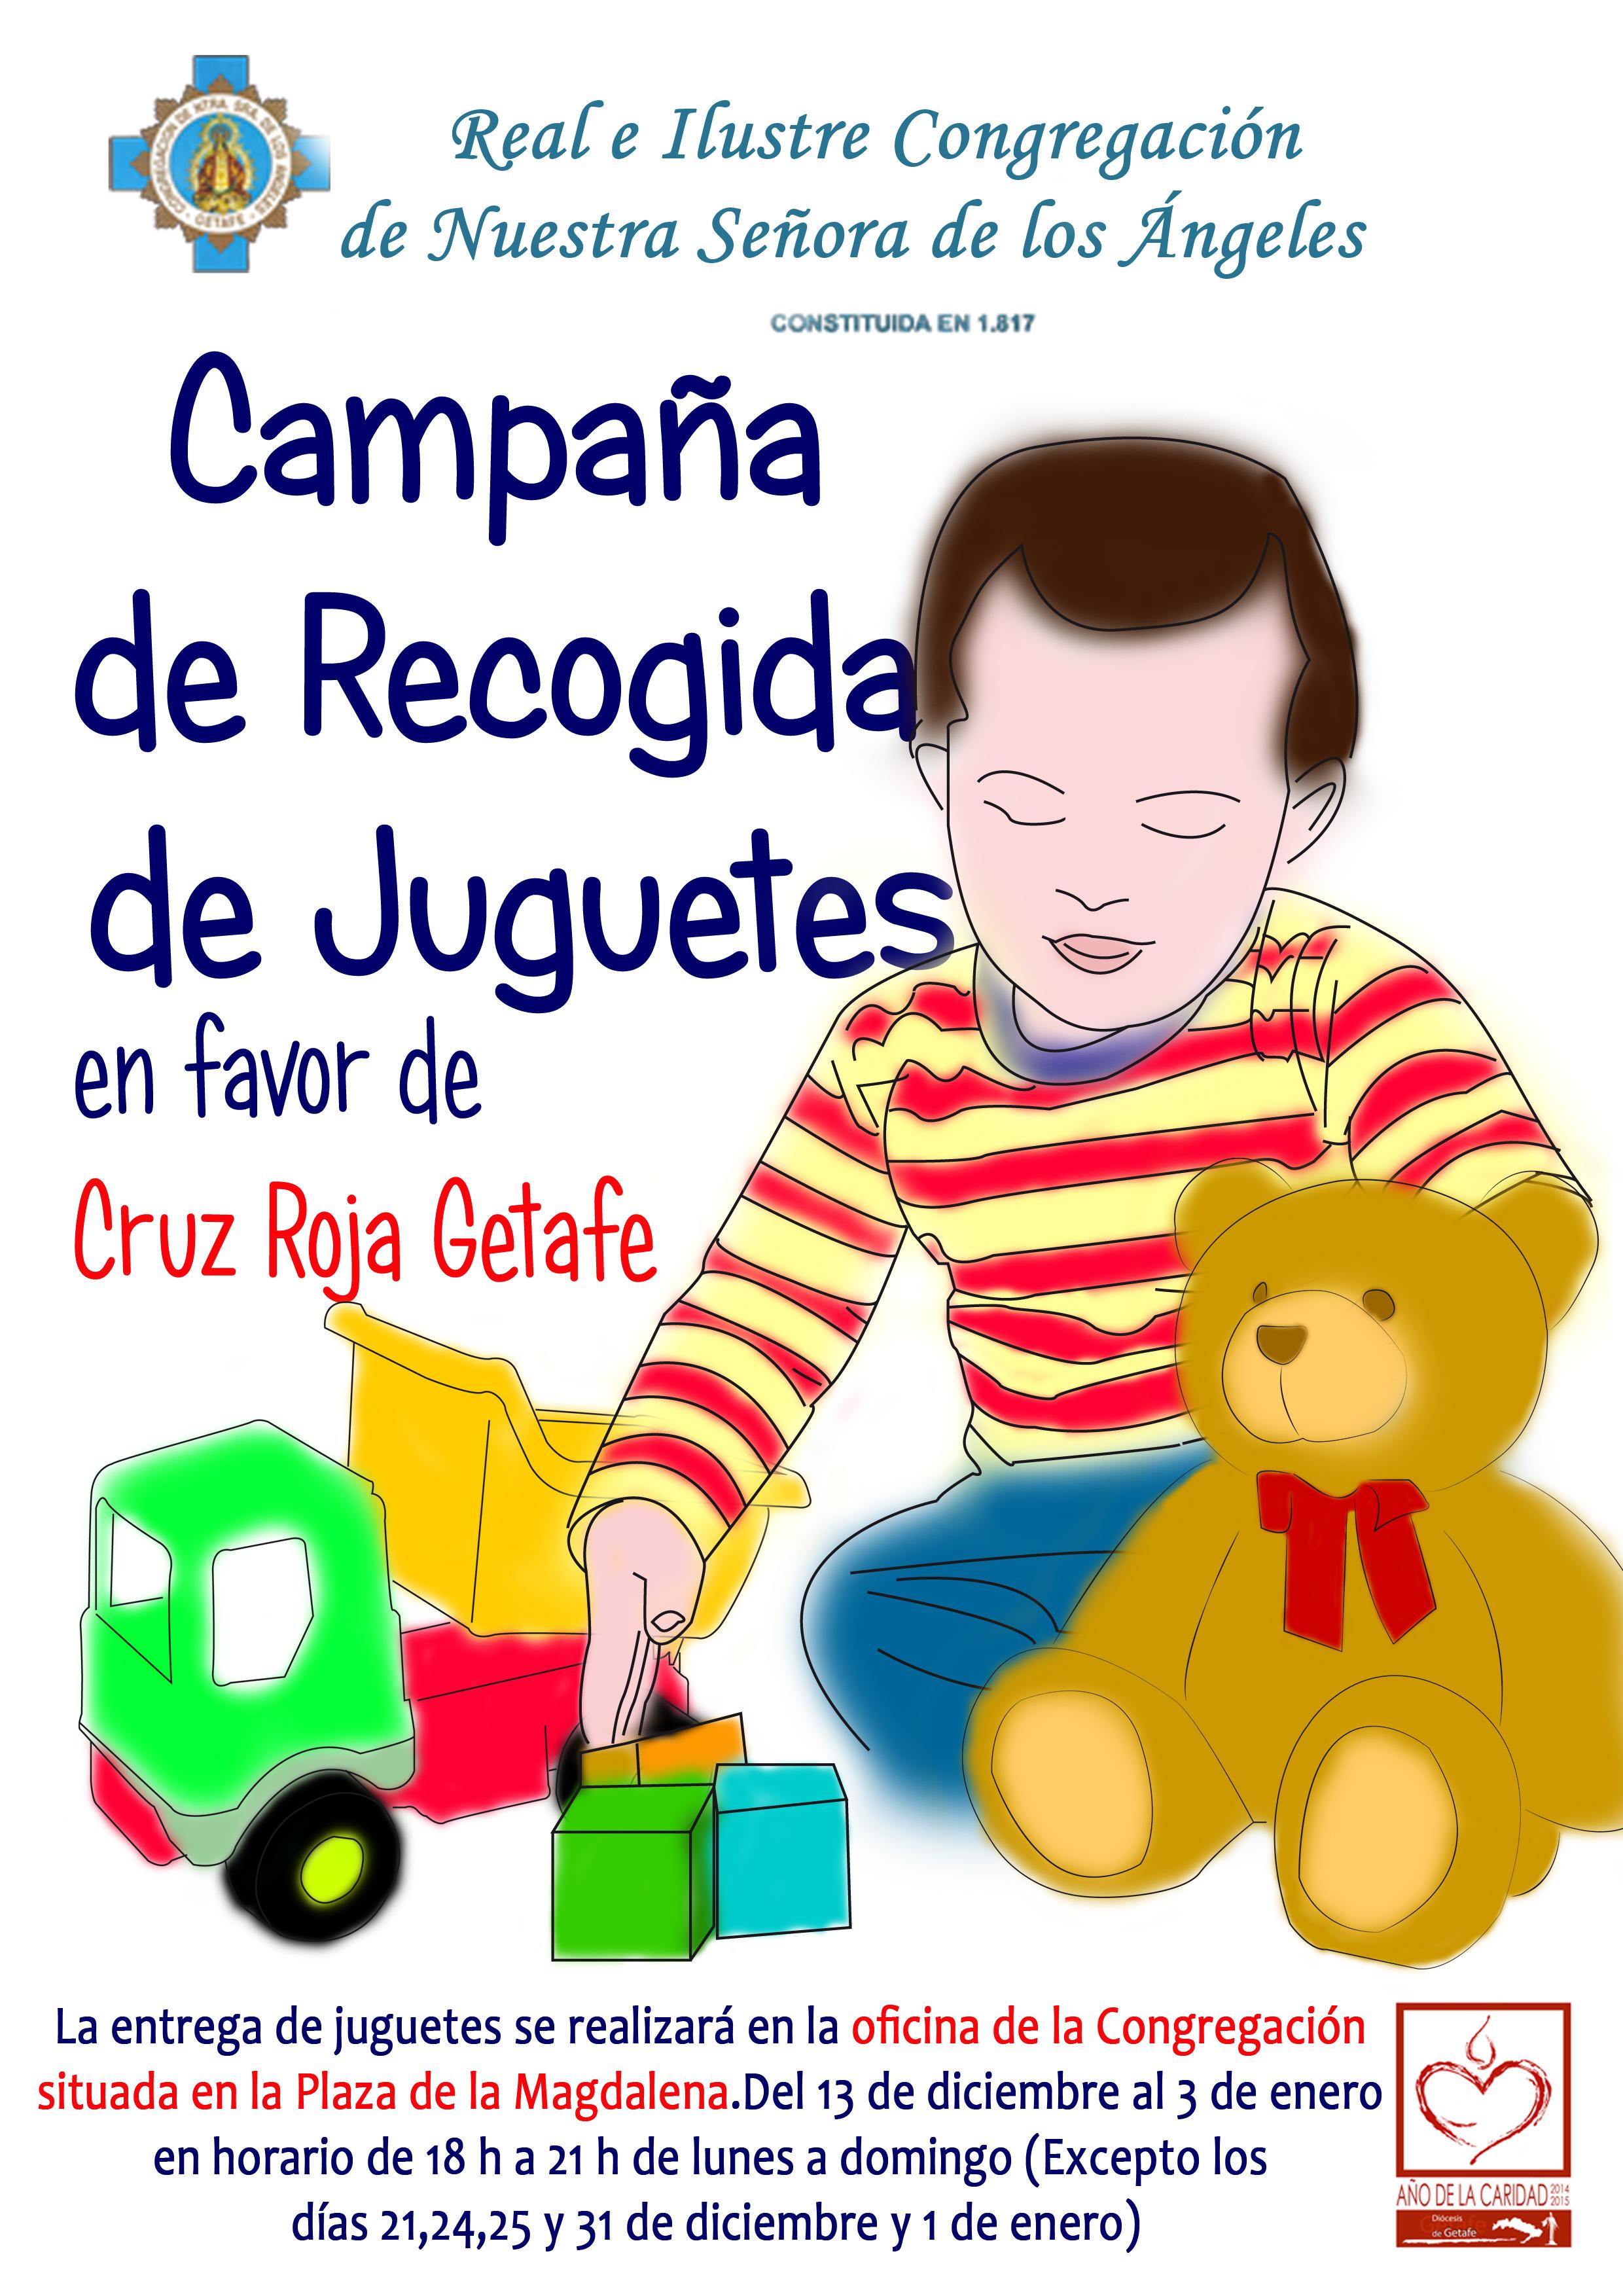 Recogida de juguetes usados en getafe